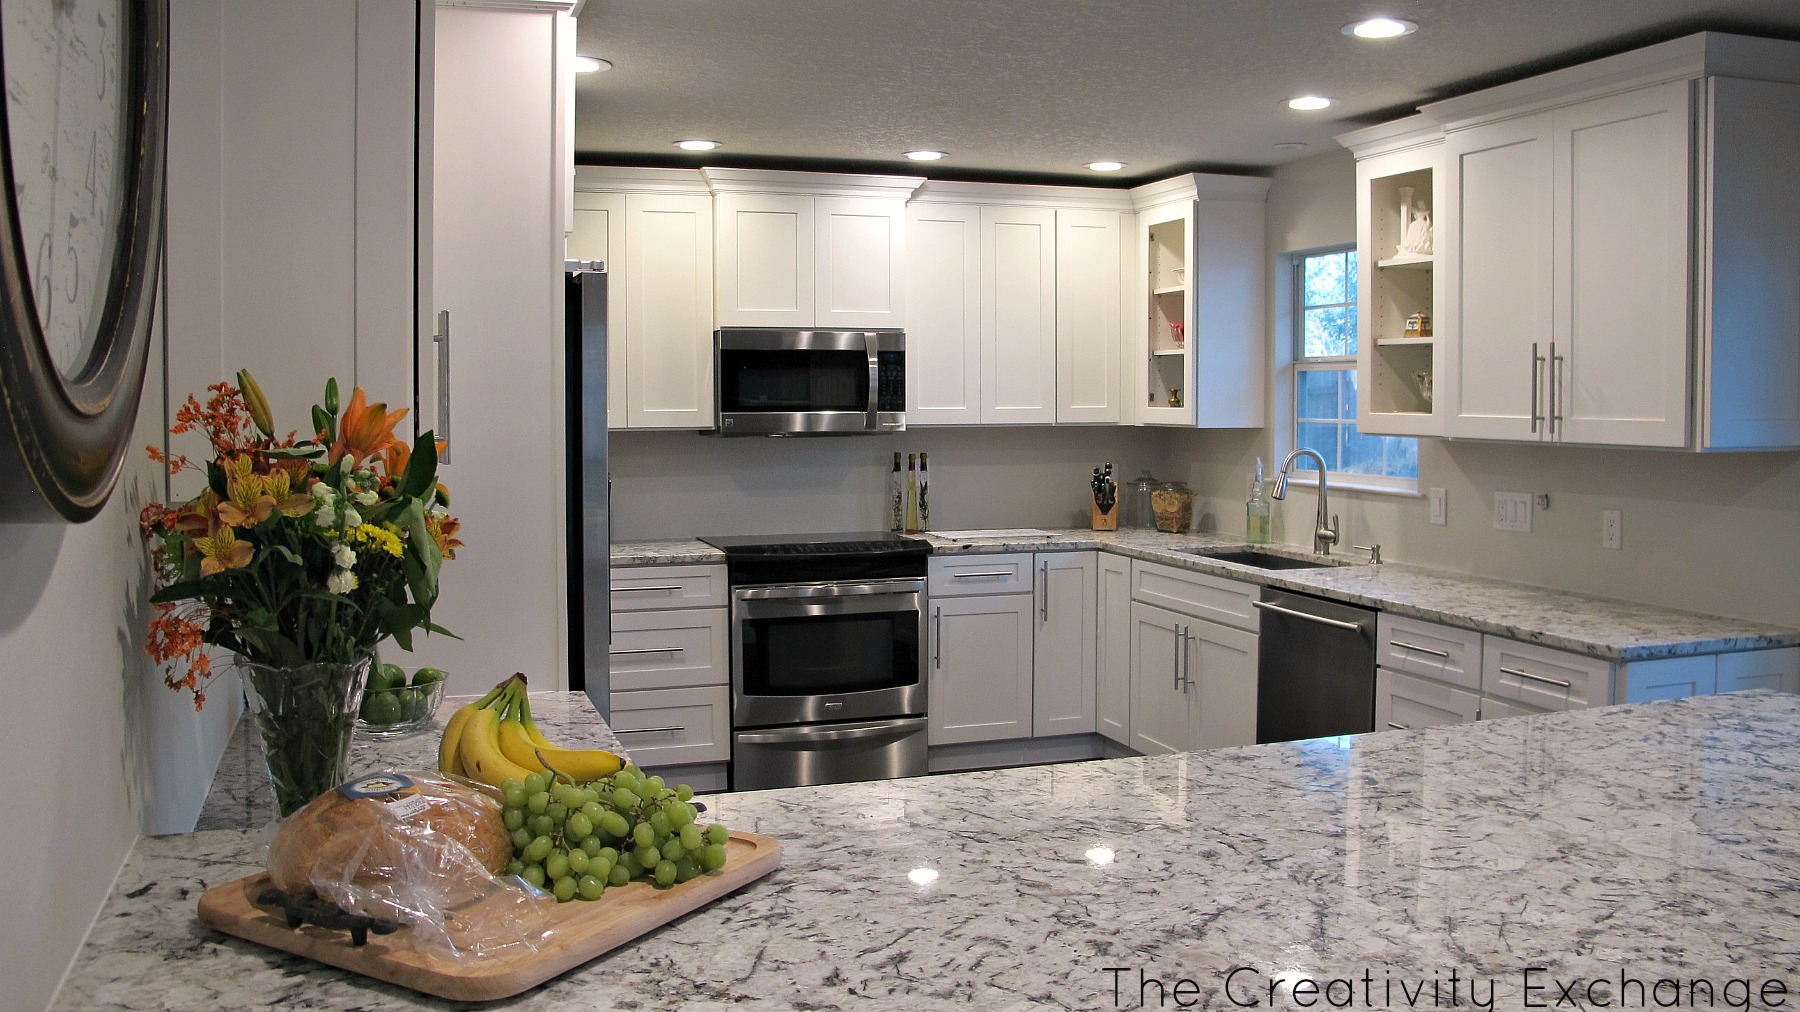 kitchen remodels before and after backsplashes cousin frank 39s amazing remodel